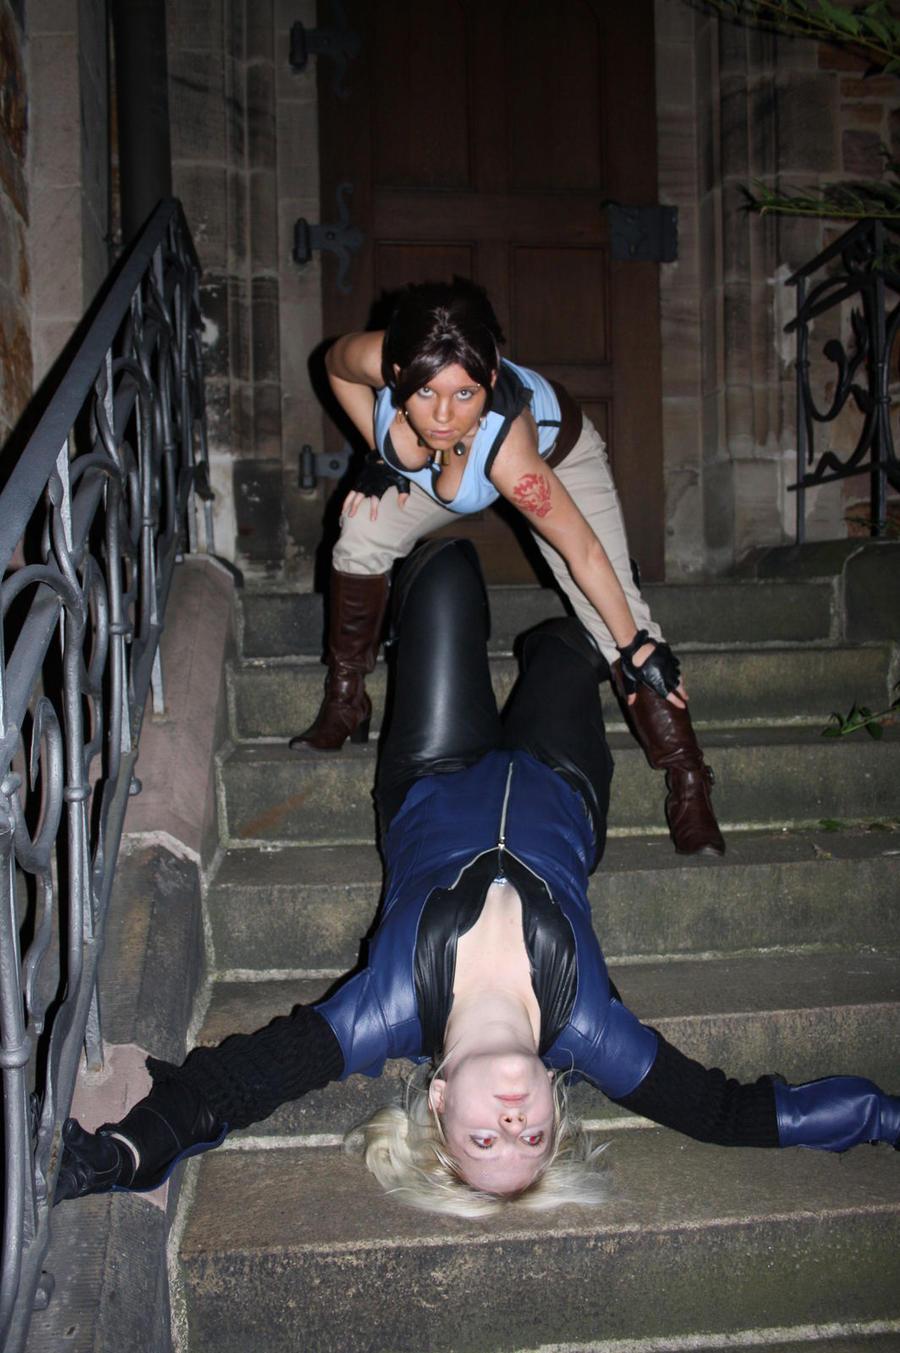 Jill Valentine Resident Evil 5 by Chaos-Sephi